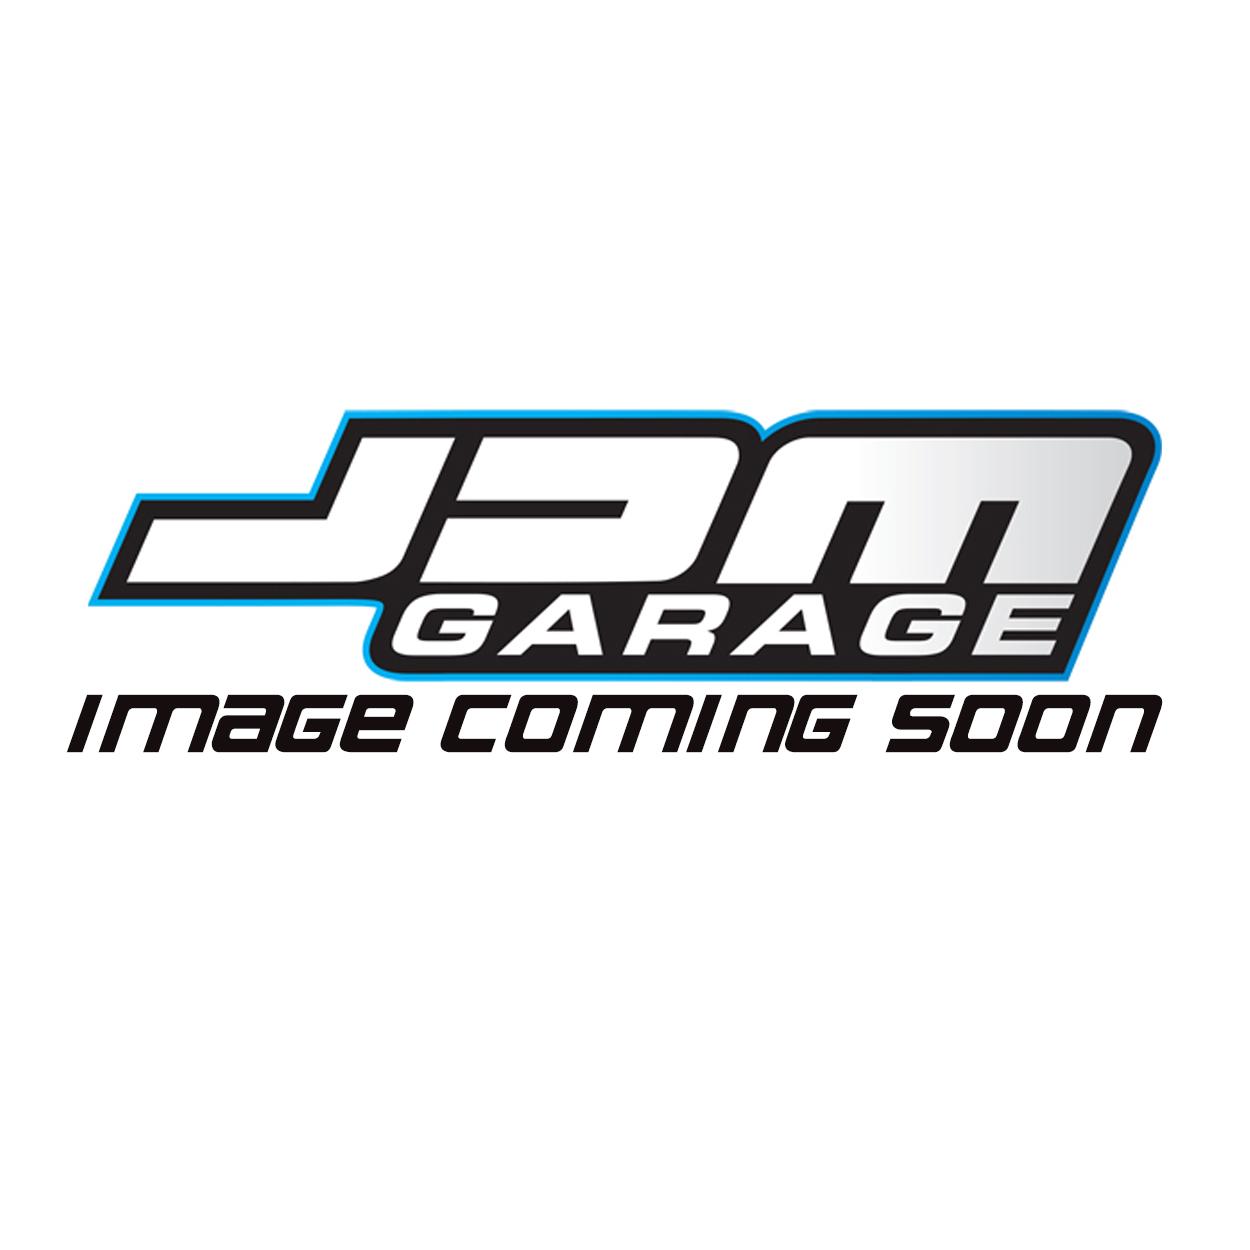 OE Replacement & EBC GD Series Front Brake Discs - Mazda MX5 Mk3 NC 05-15